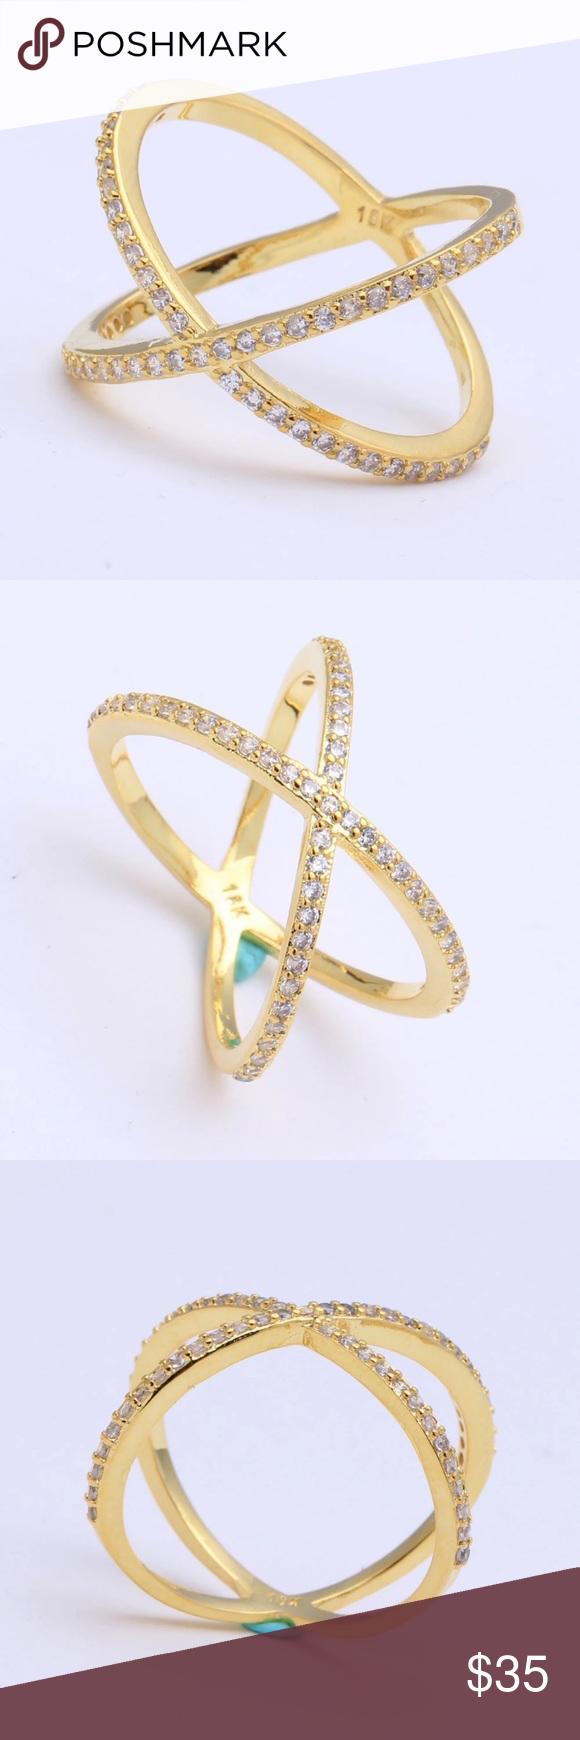 Gold Diamond Crisscross X Style Ring NWT Boutique